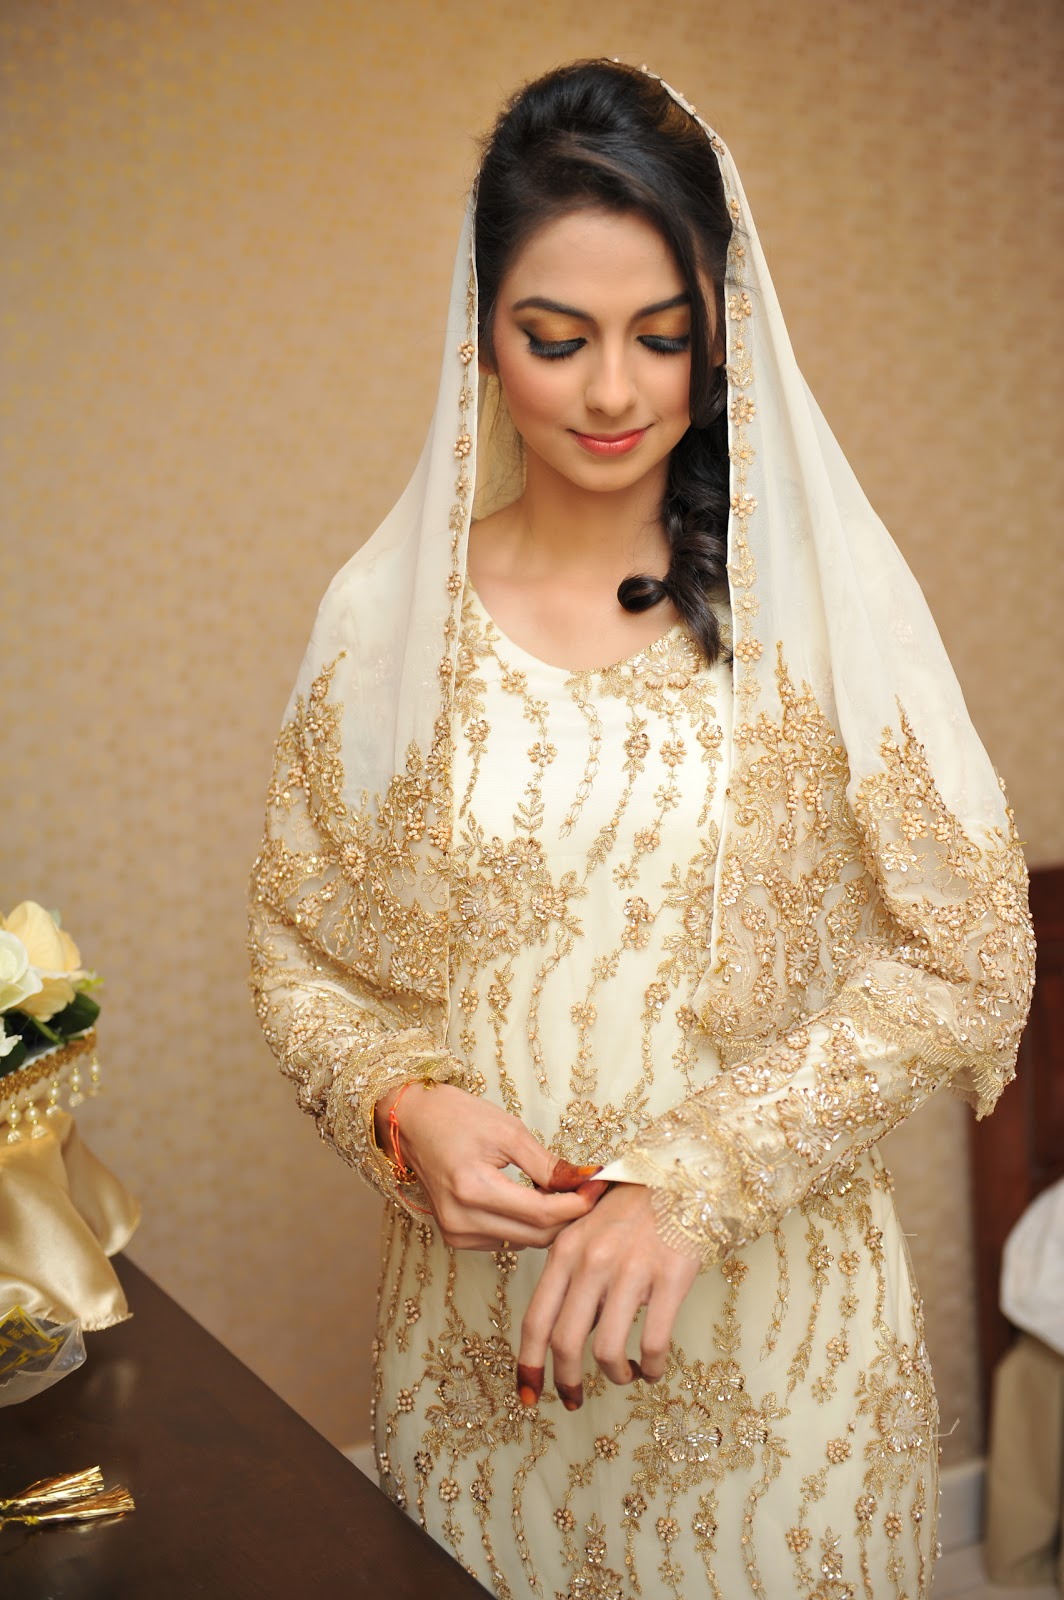 weddingdressesforrent blogspot wedding dress for rent Front view of the dress